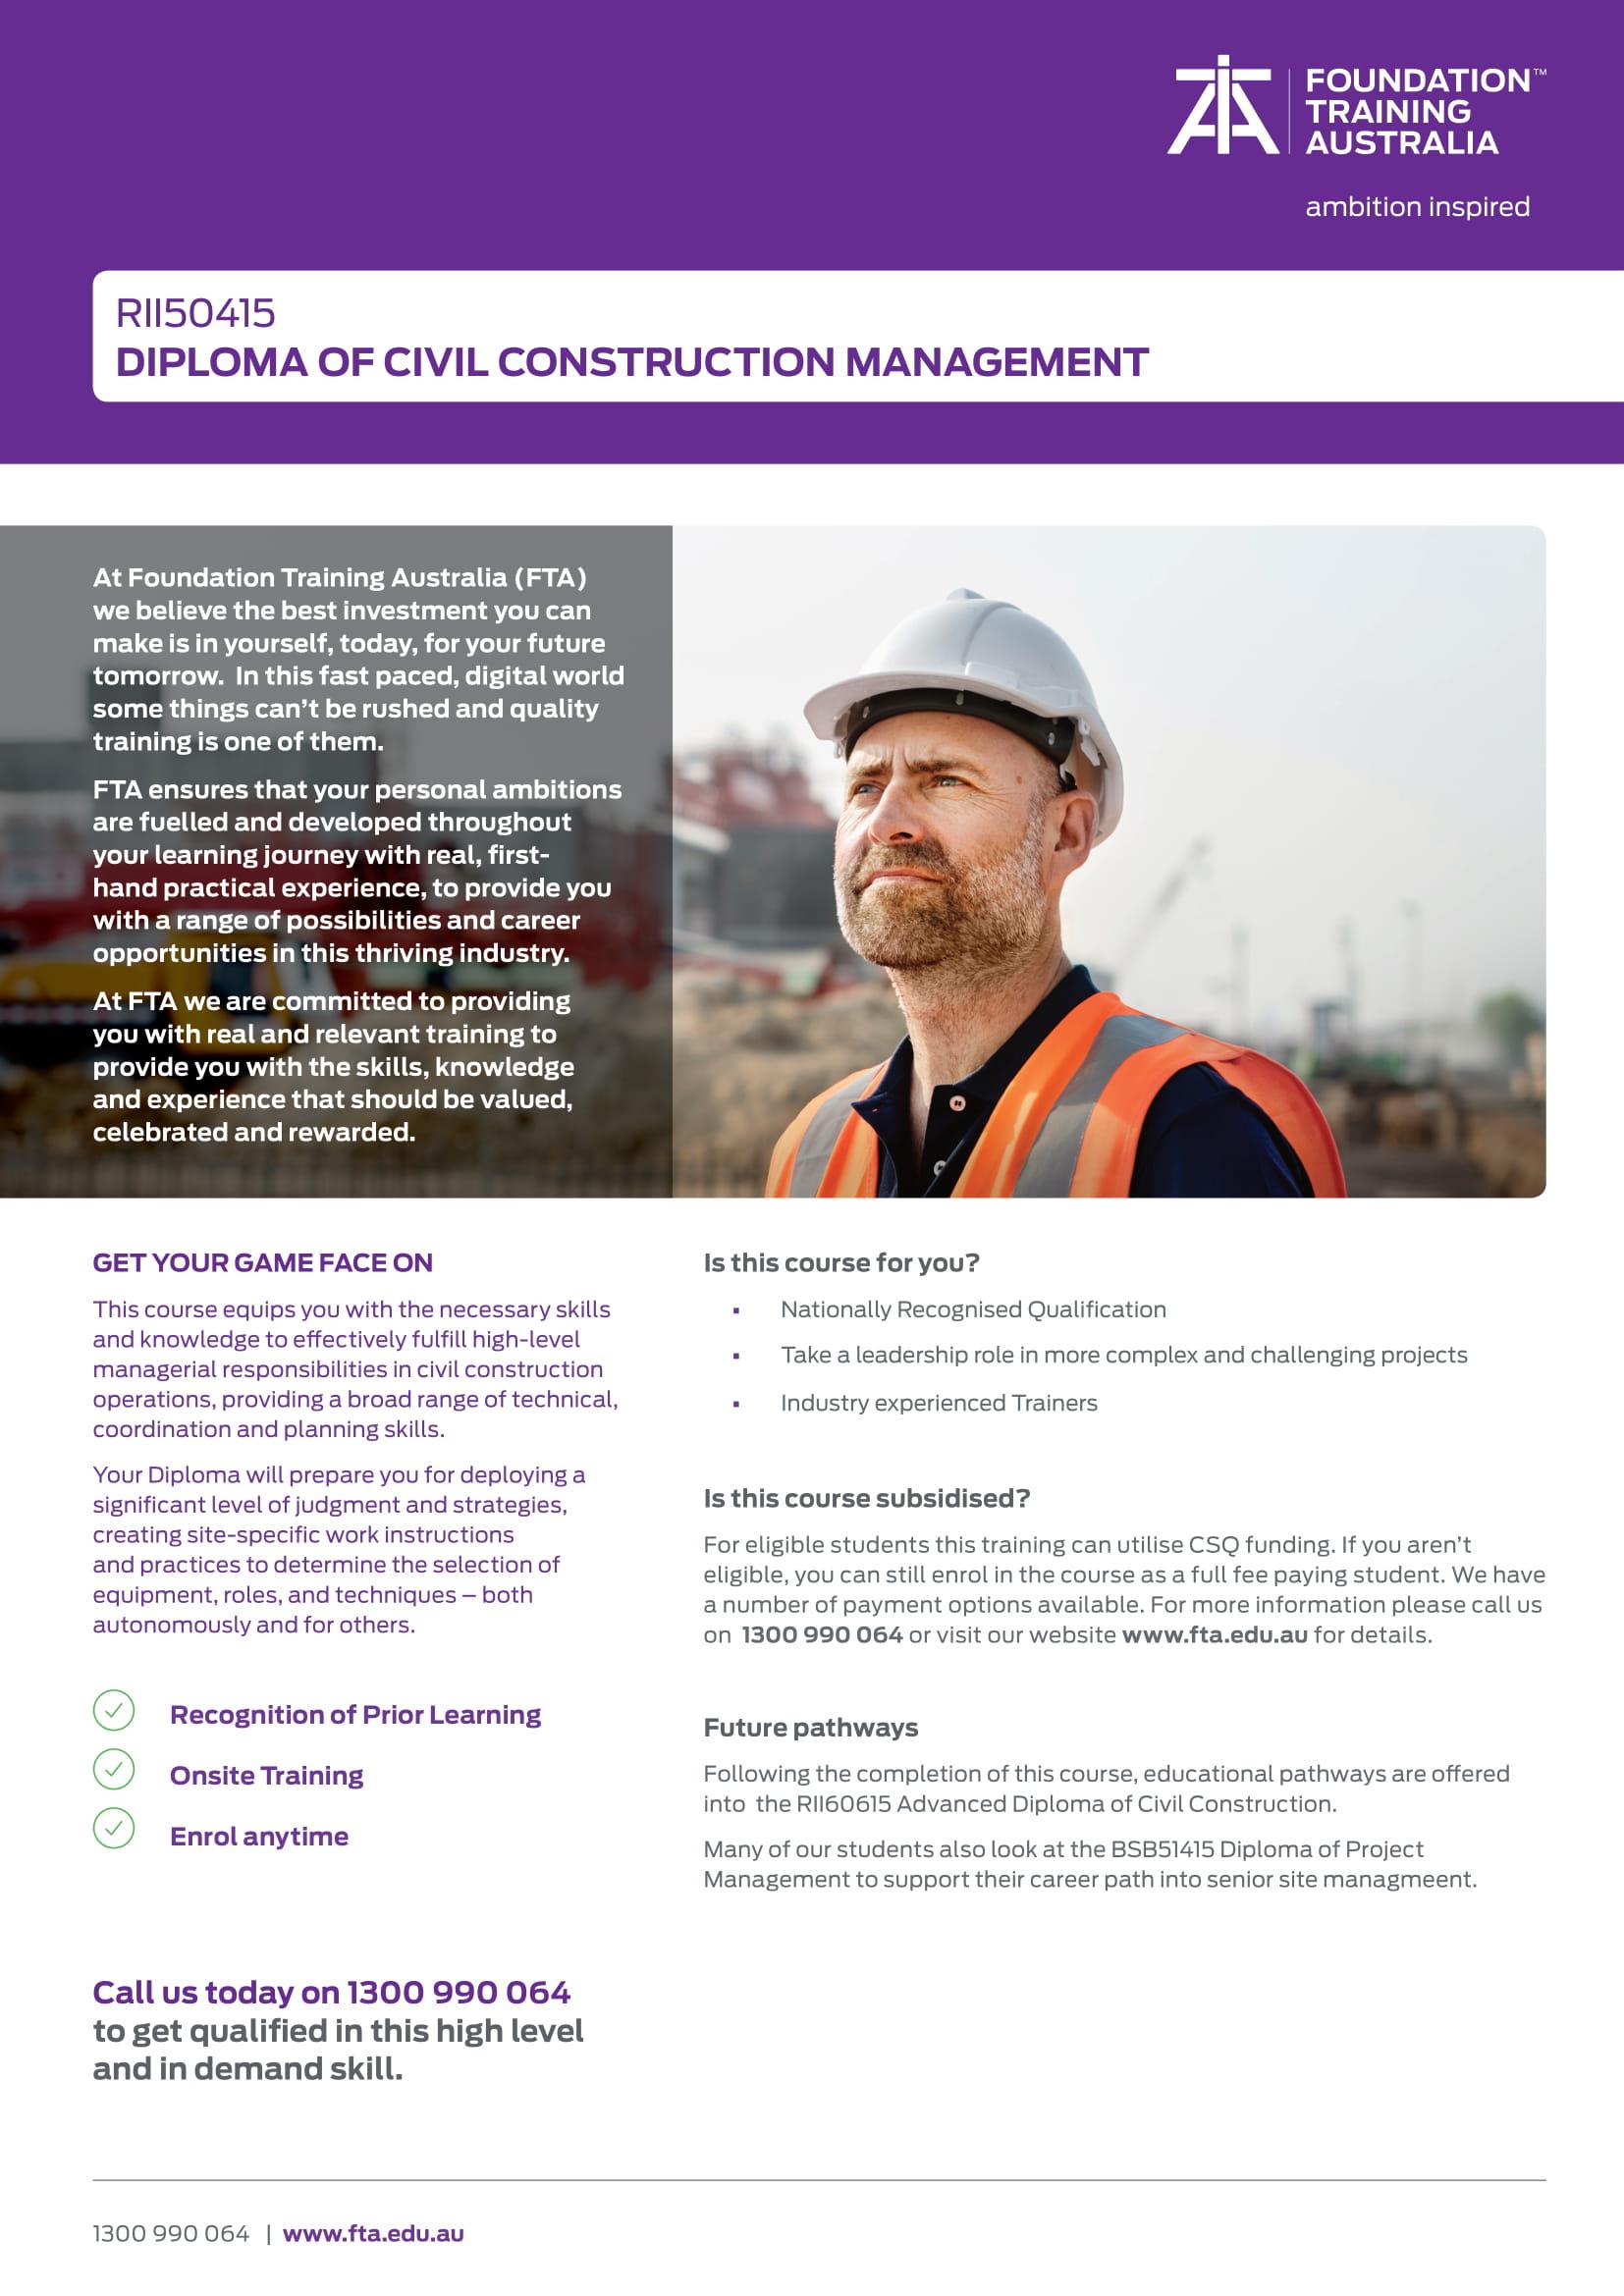 https://www.fta.edu.au/wp-content/uploads/2020/06/TP1.MK_.021-Diploma-of-Civil-Construction-Management-RII50415-1.jpg